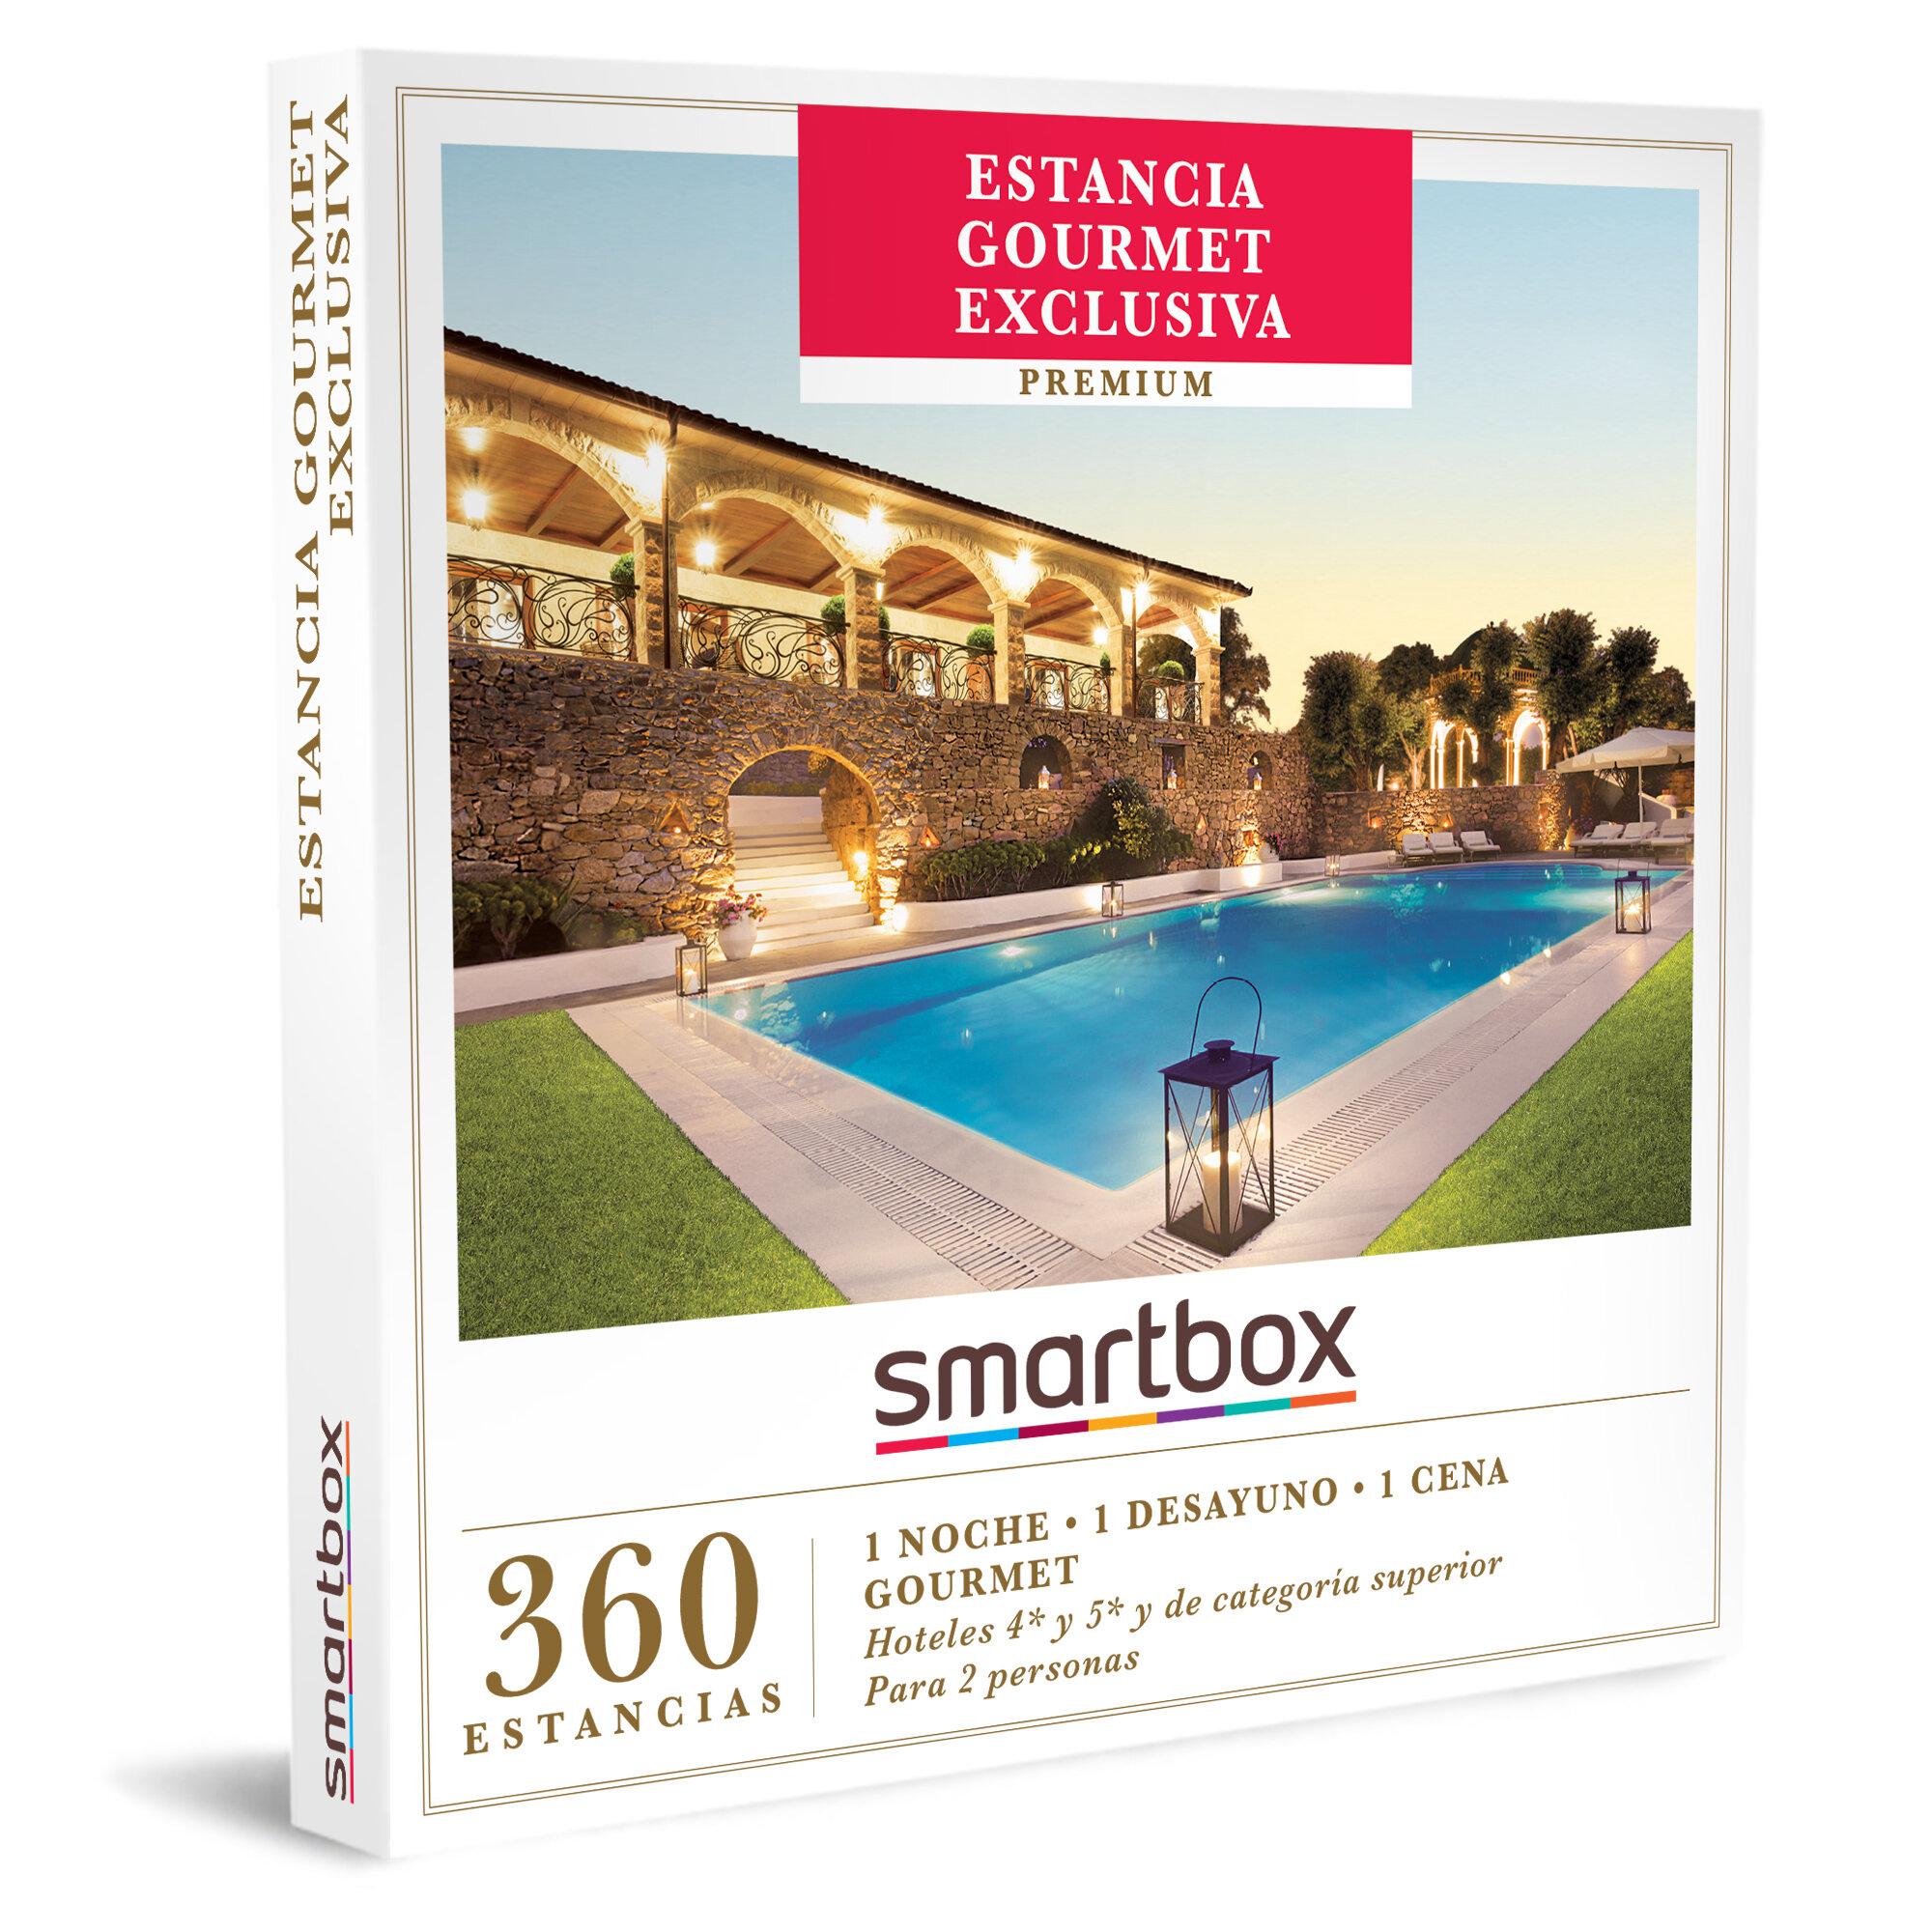 Smartbox |Estancia gourmet exclusiva